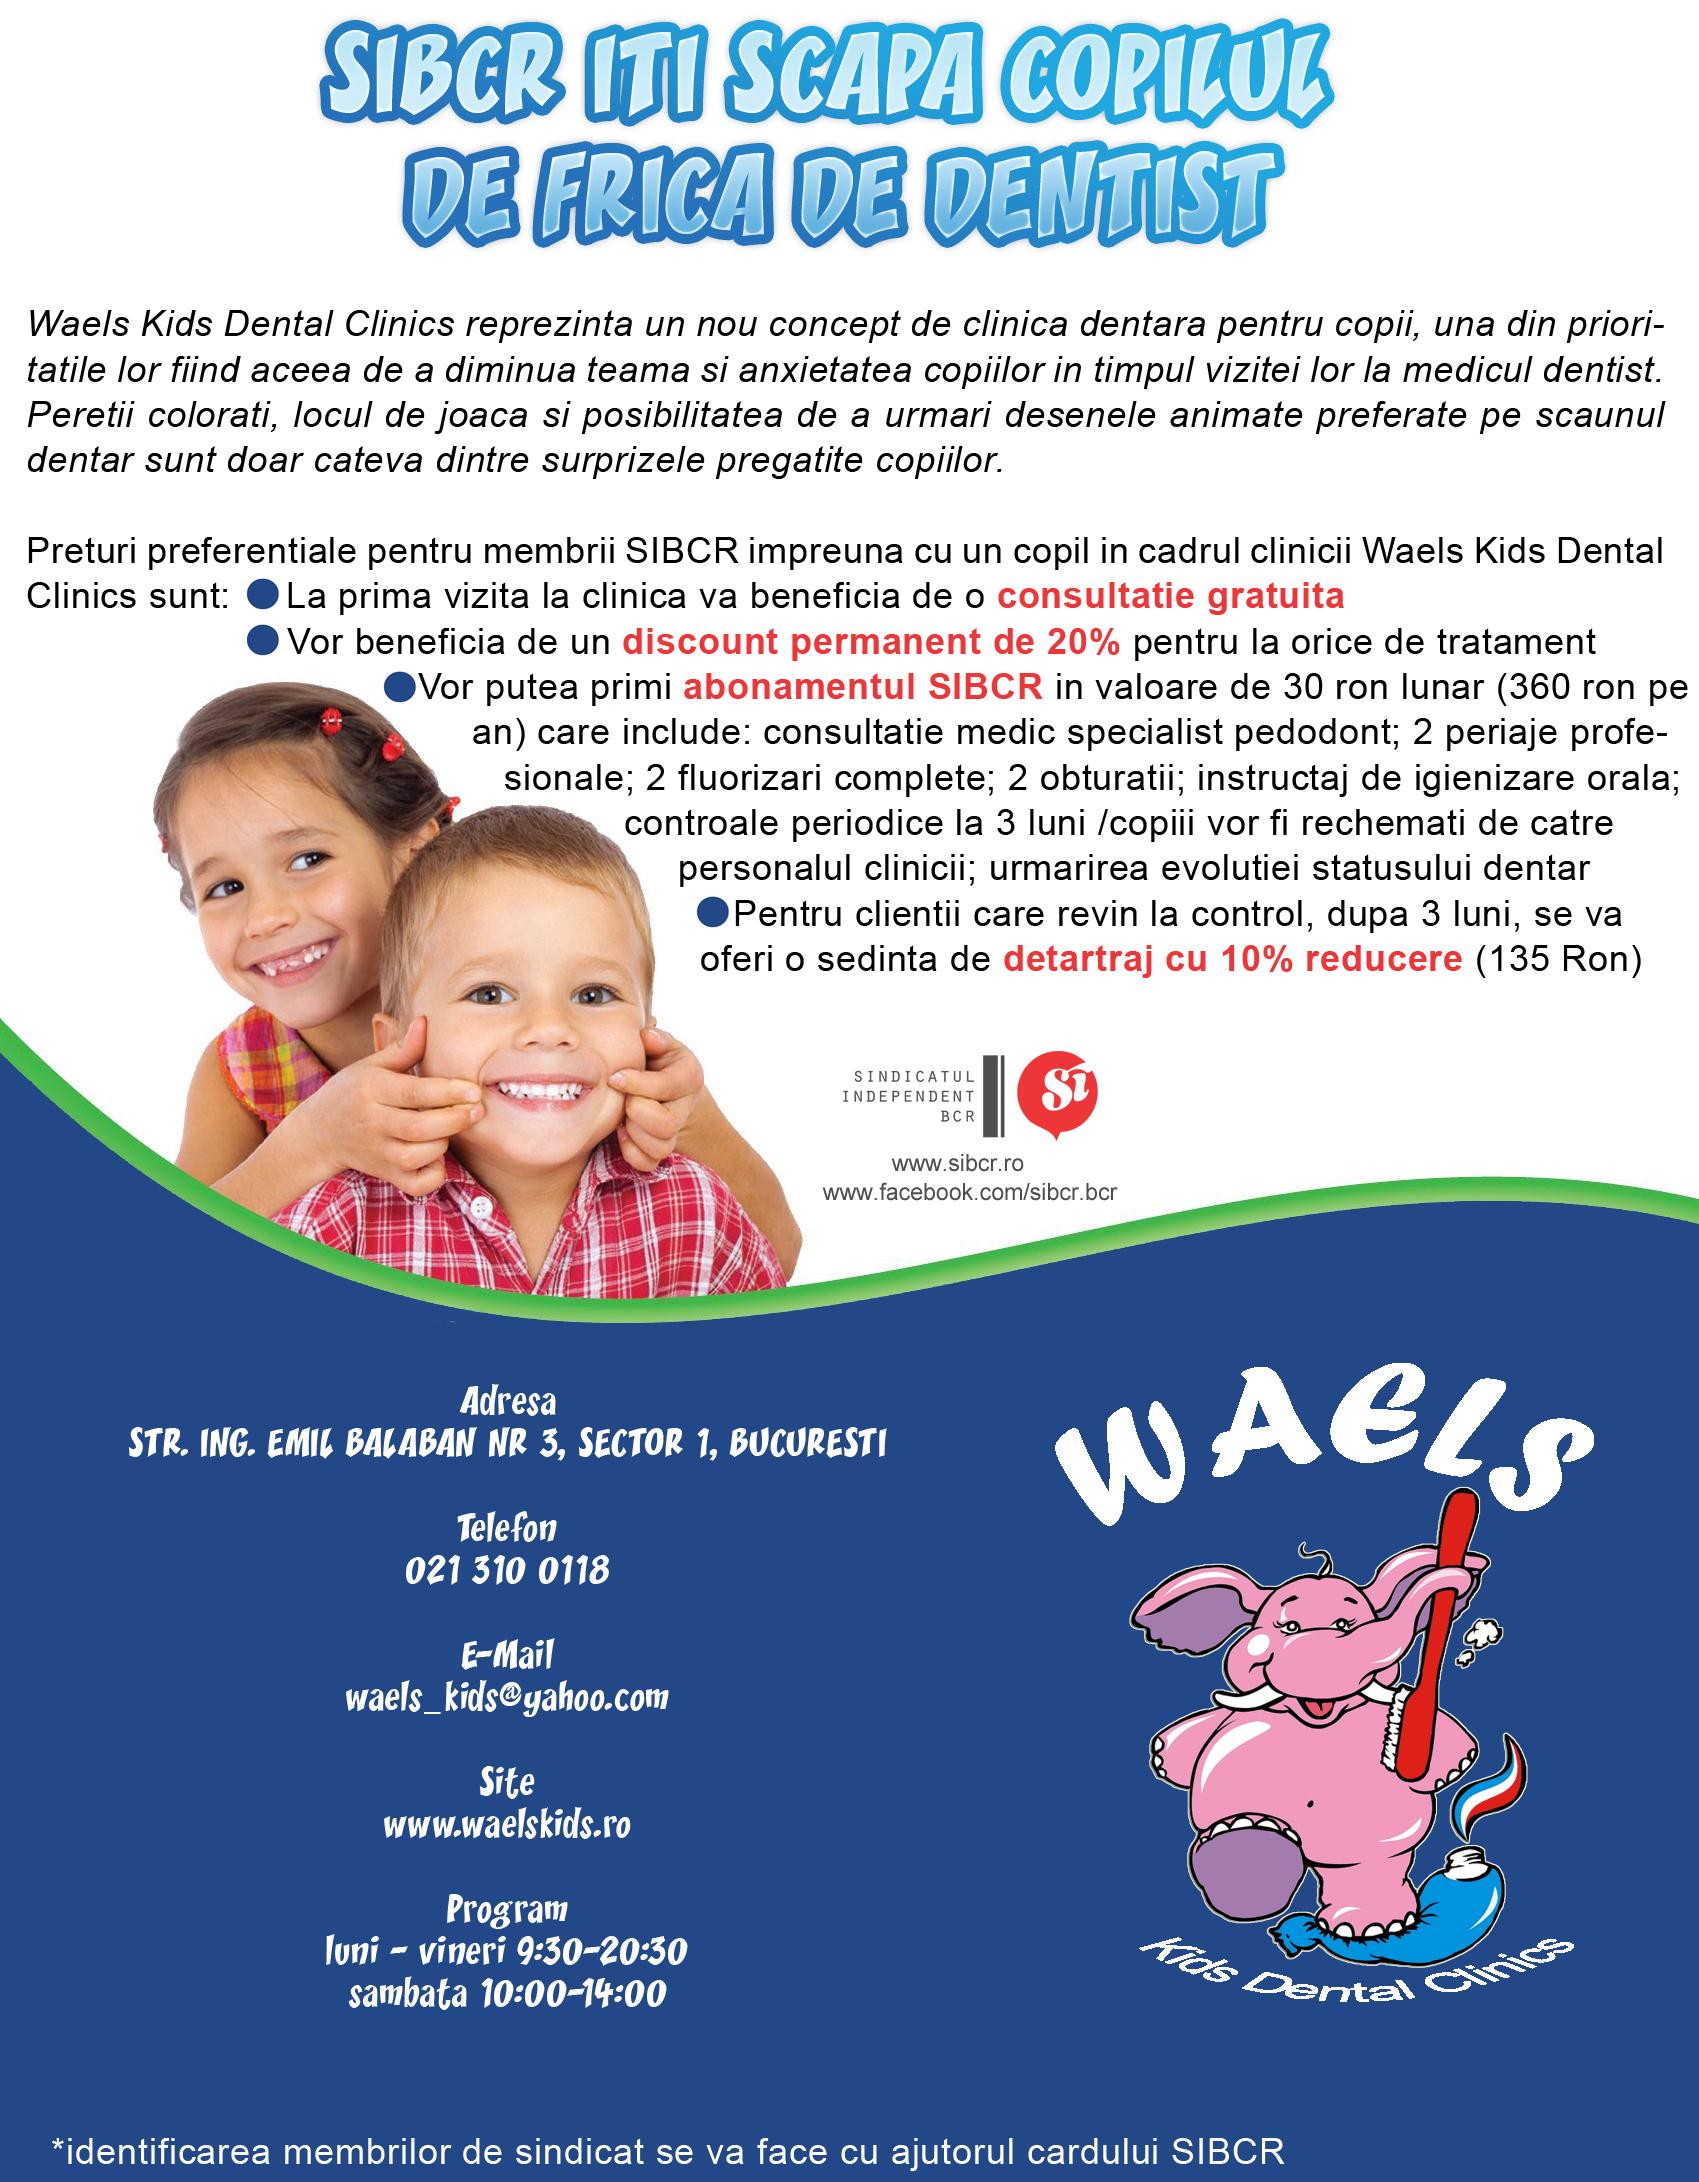 Waels Kids Dental Clinical